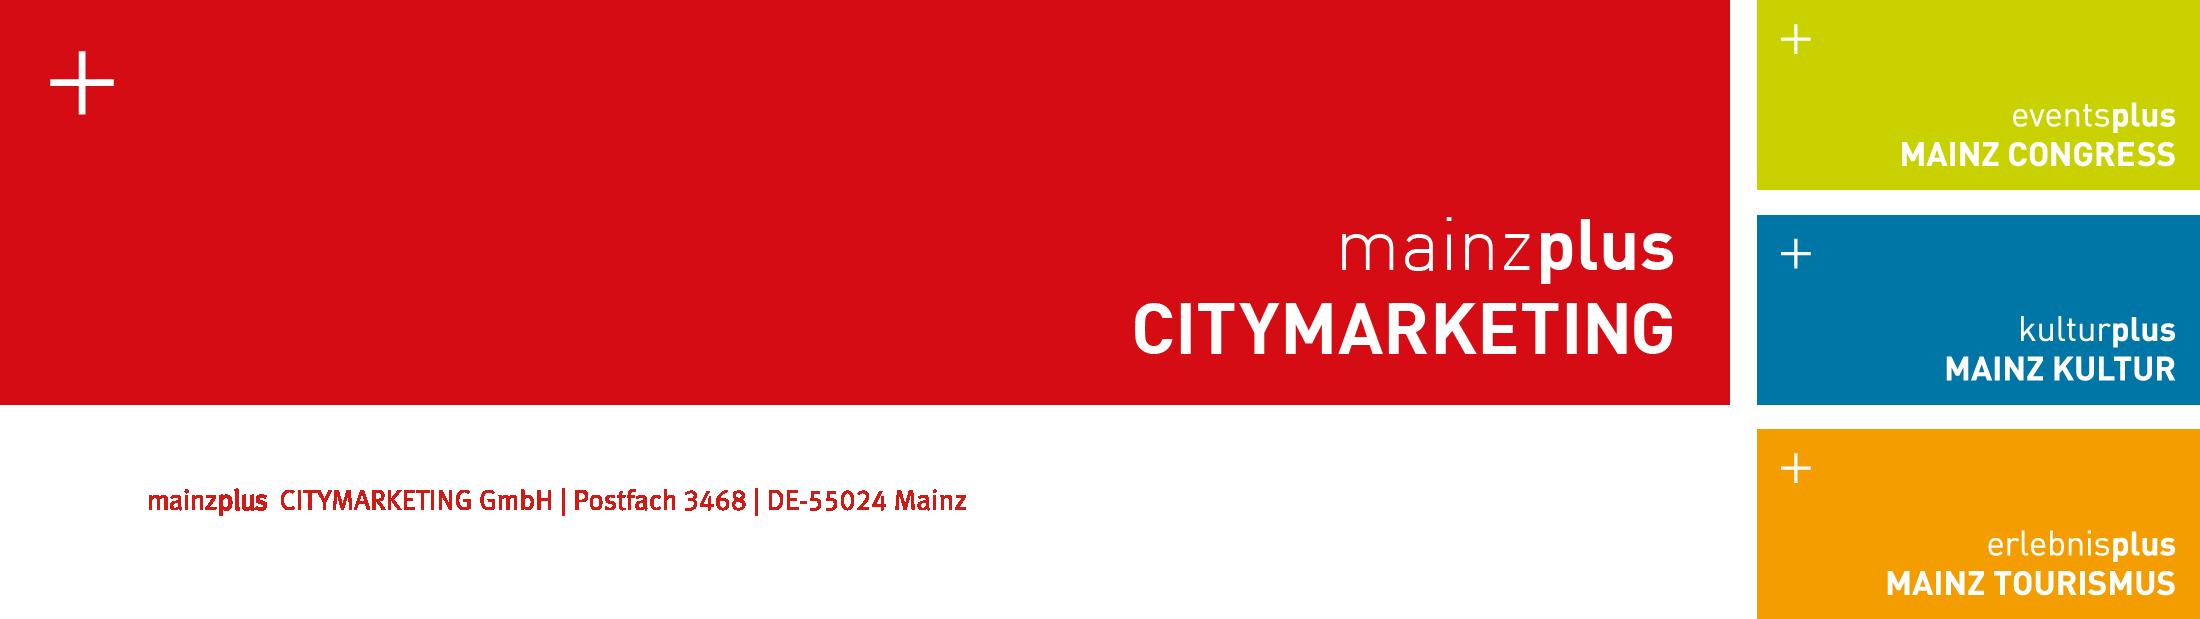 mainzplus CITYMARKETING GmbH